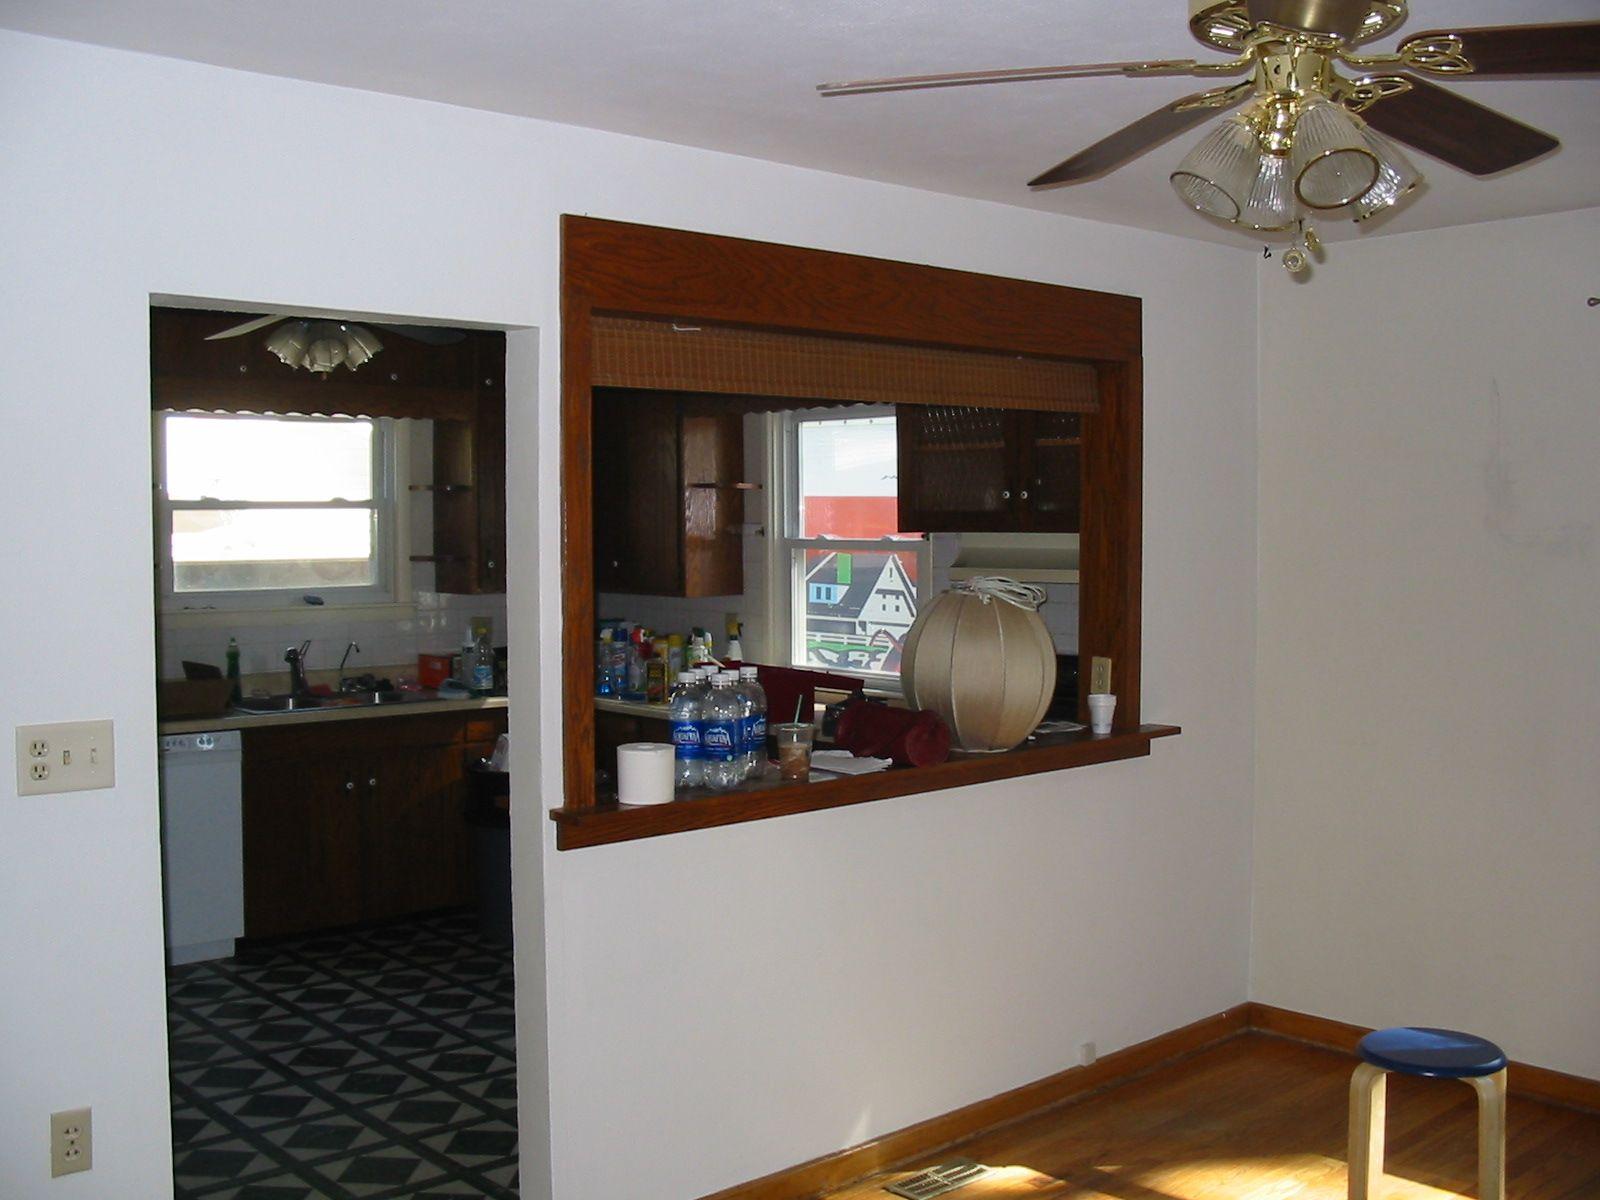 pass through kitchen window backsplash ideas for add some molding around to polish